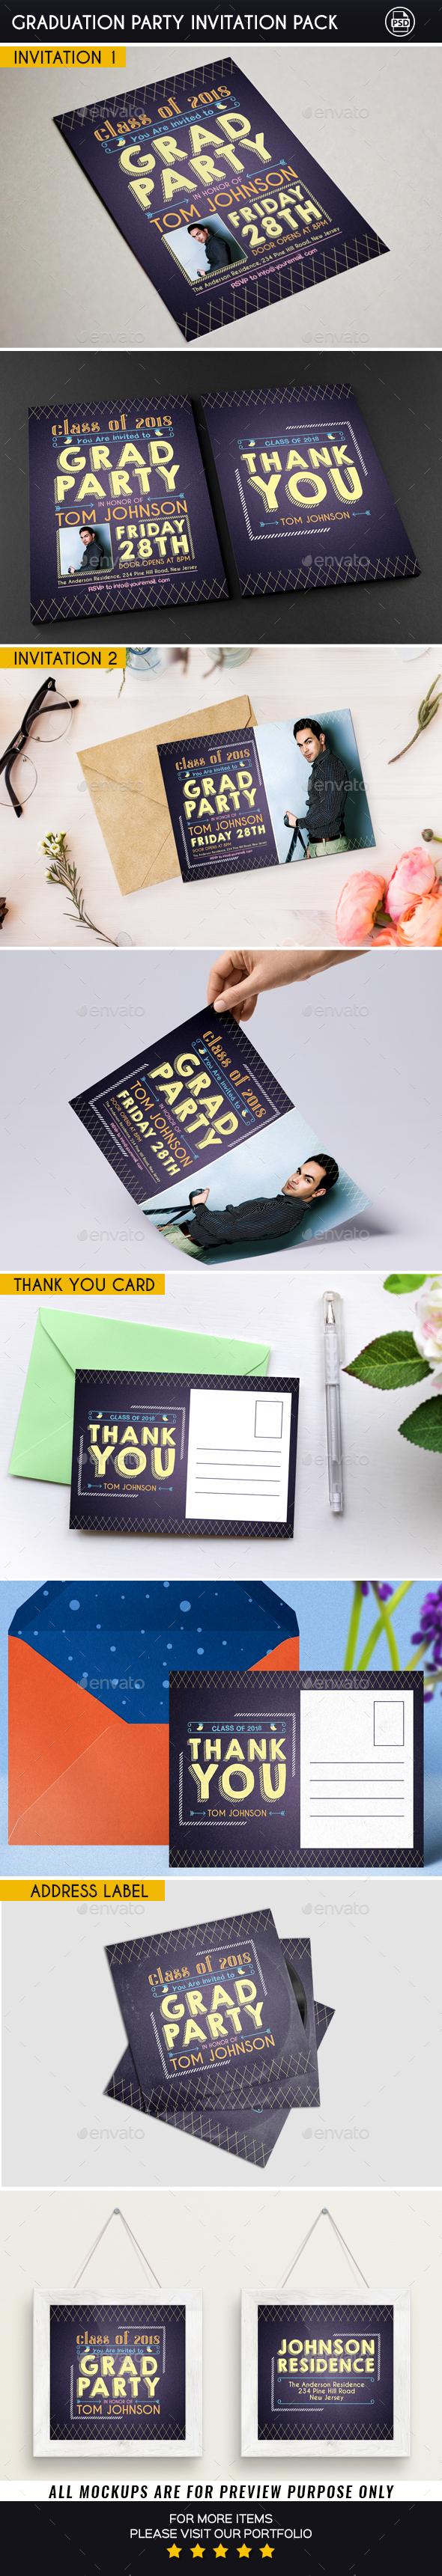 Graduation Party Invitation Pack - Invitations Cards & Invites